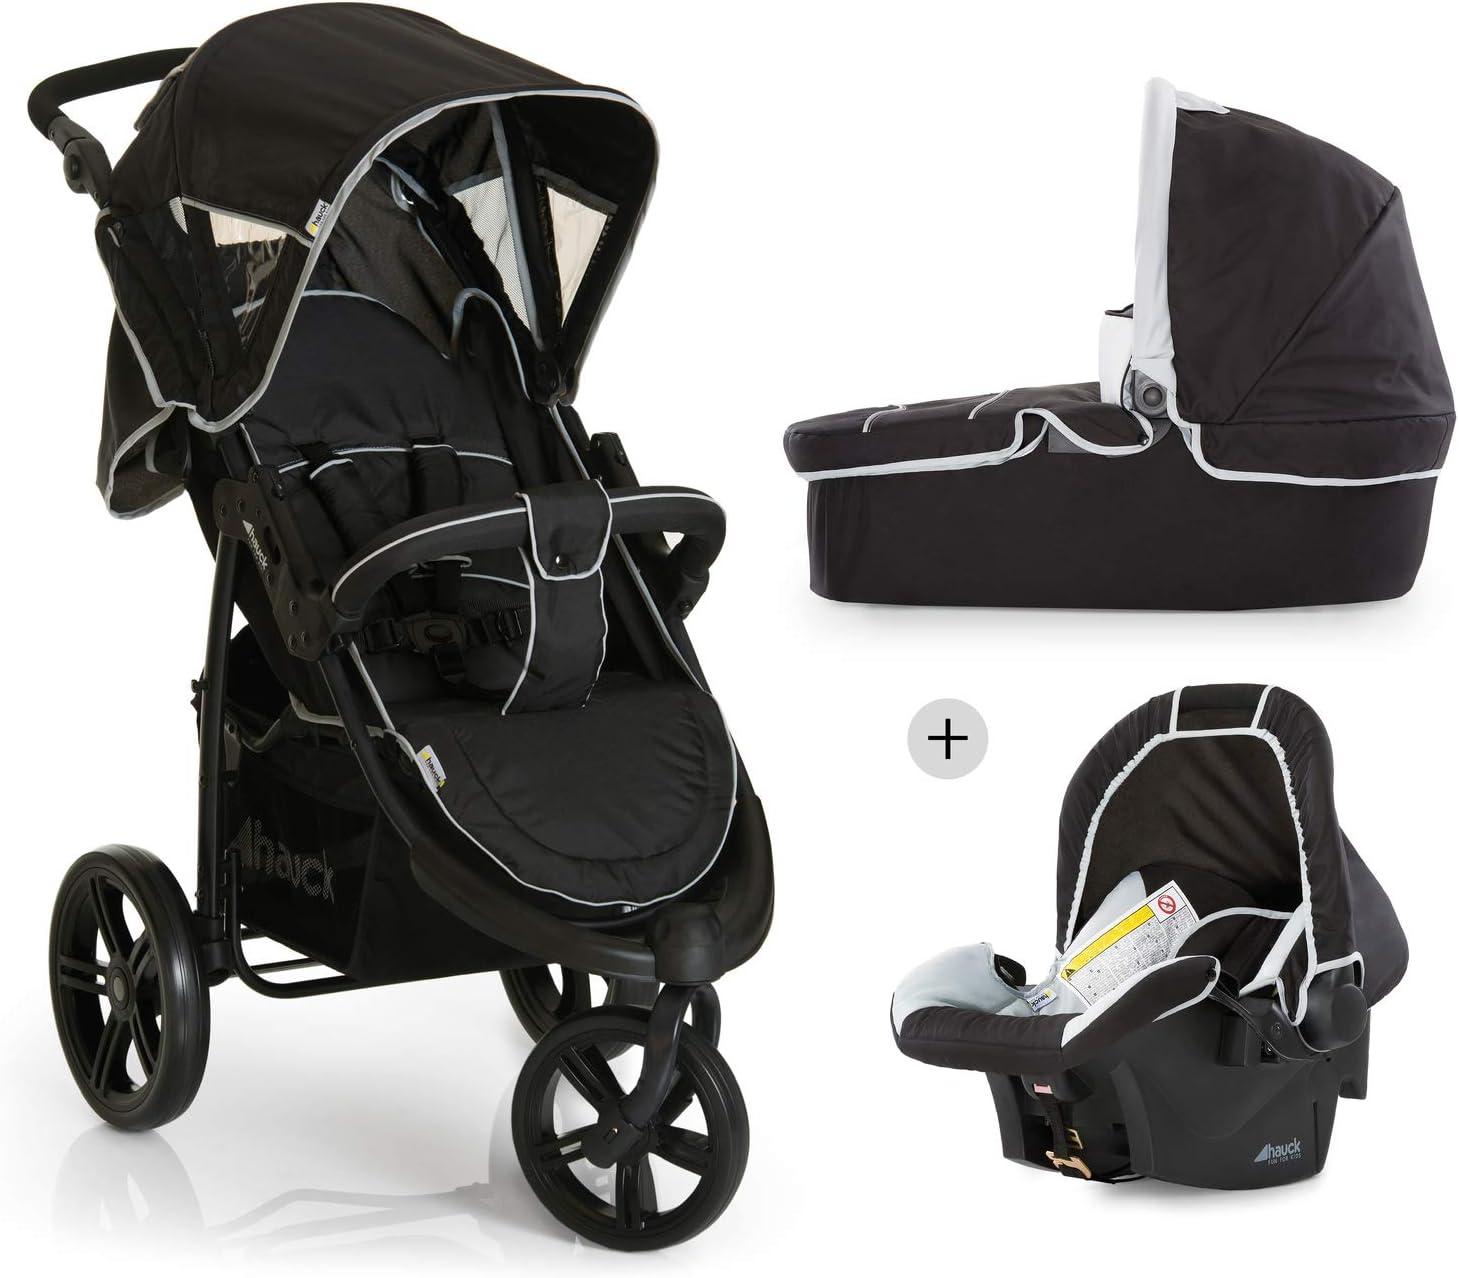 Hauck Viper SLX Trio Set - Carro deportivo 3 ruedas, silla de auto gr. 0, capazo con colchon, respaldo reclinable, ligero, 0 meses a 25 kg, plegable compacto, manillar ajustable en altura, negro gris